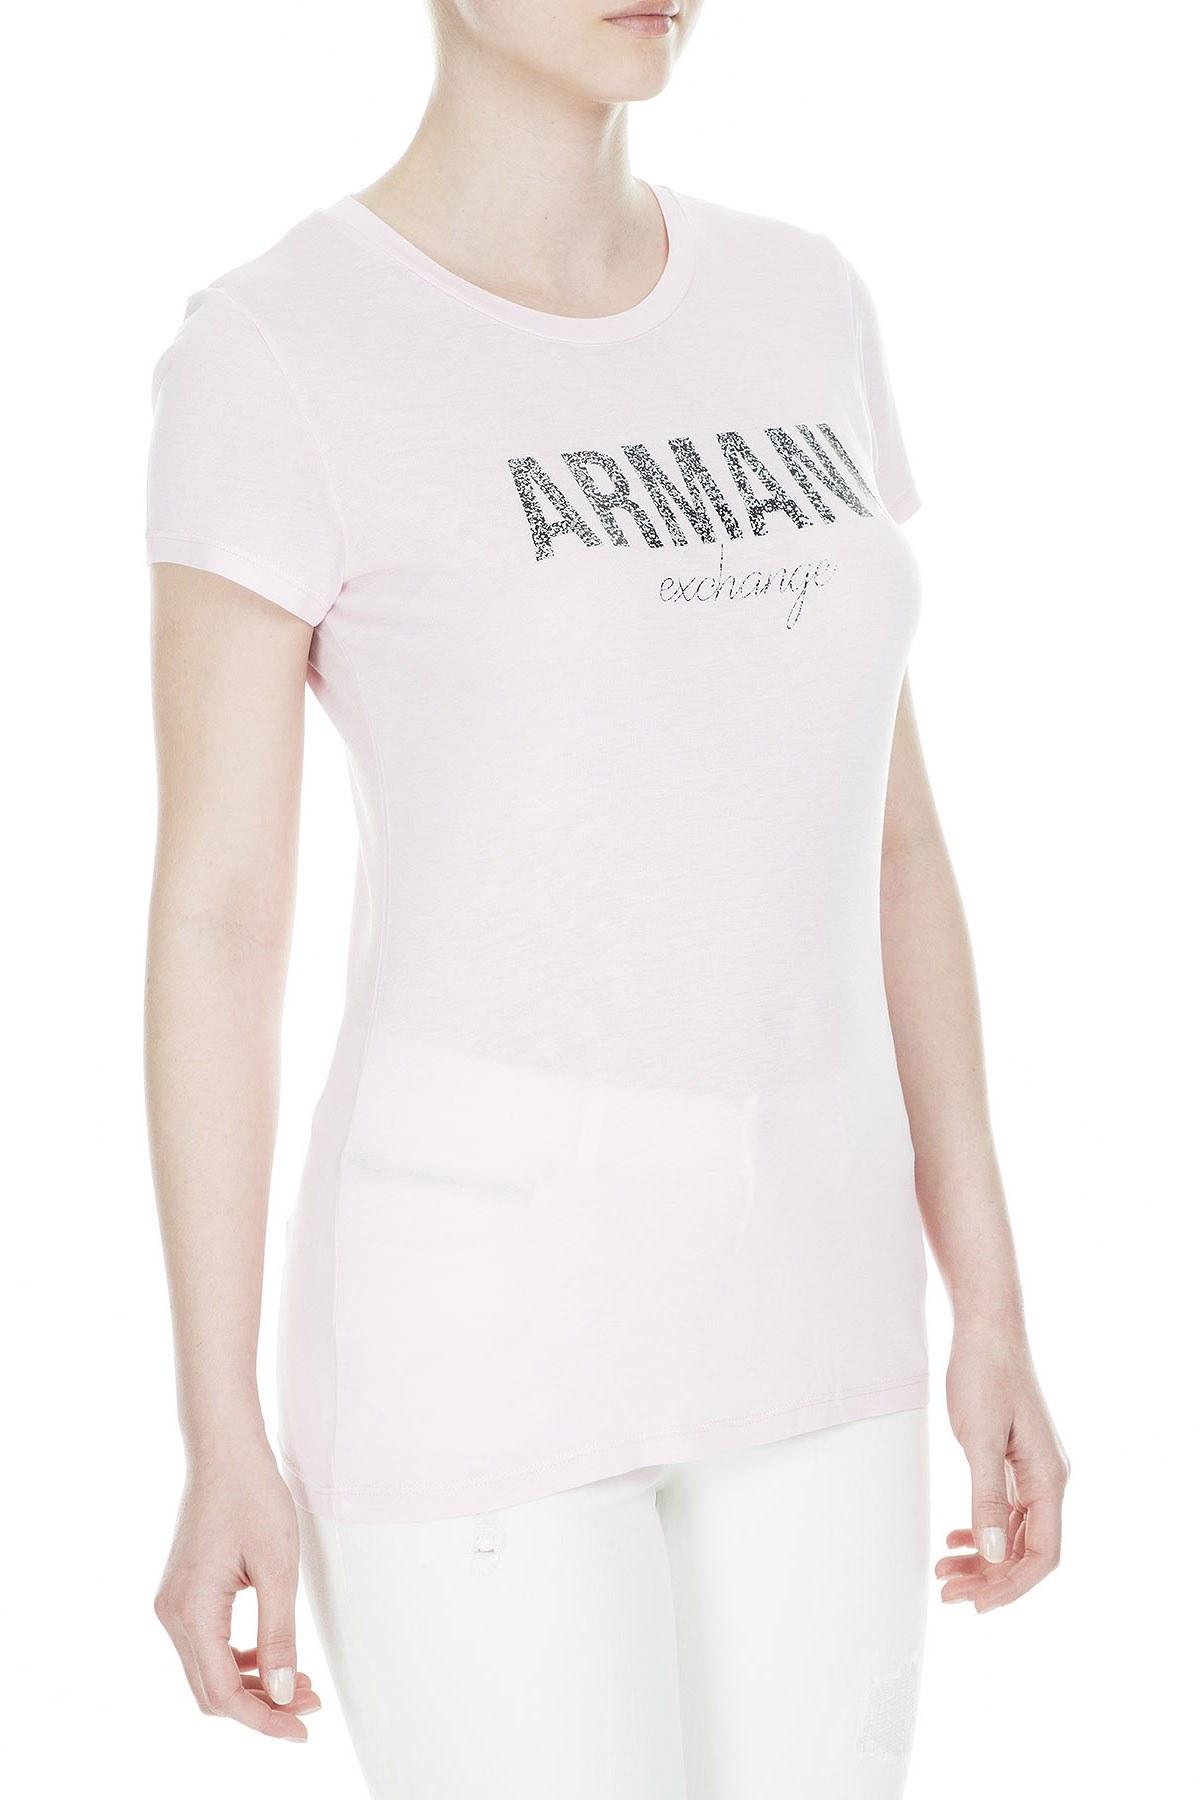 Armani Exchange Bayan T Shirt 8NYT98 Y9C8Z 1453 PEMBE